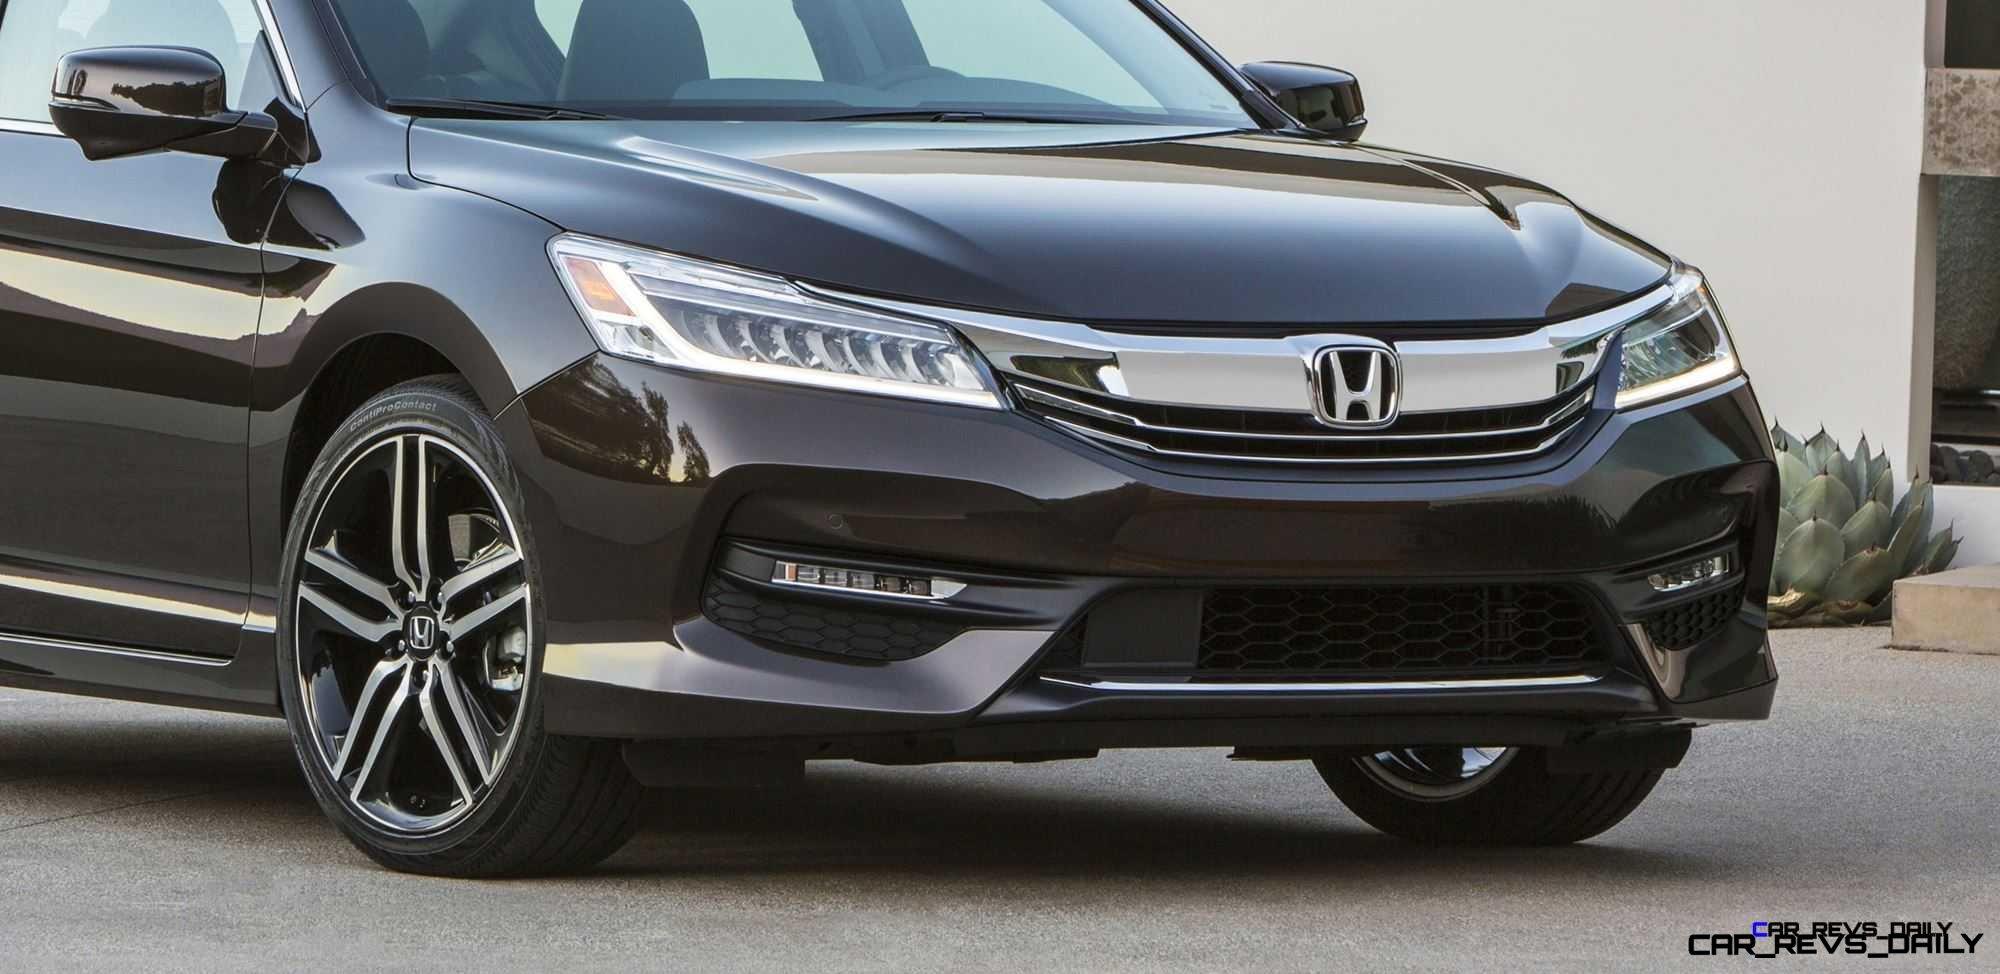 2016 Honda Accord Bringing Tech-Tastic LED and Infotainment Updates